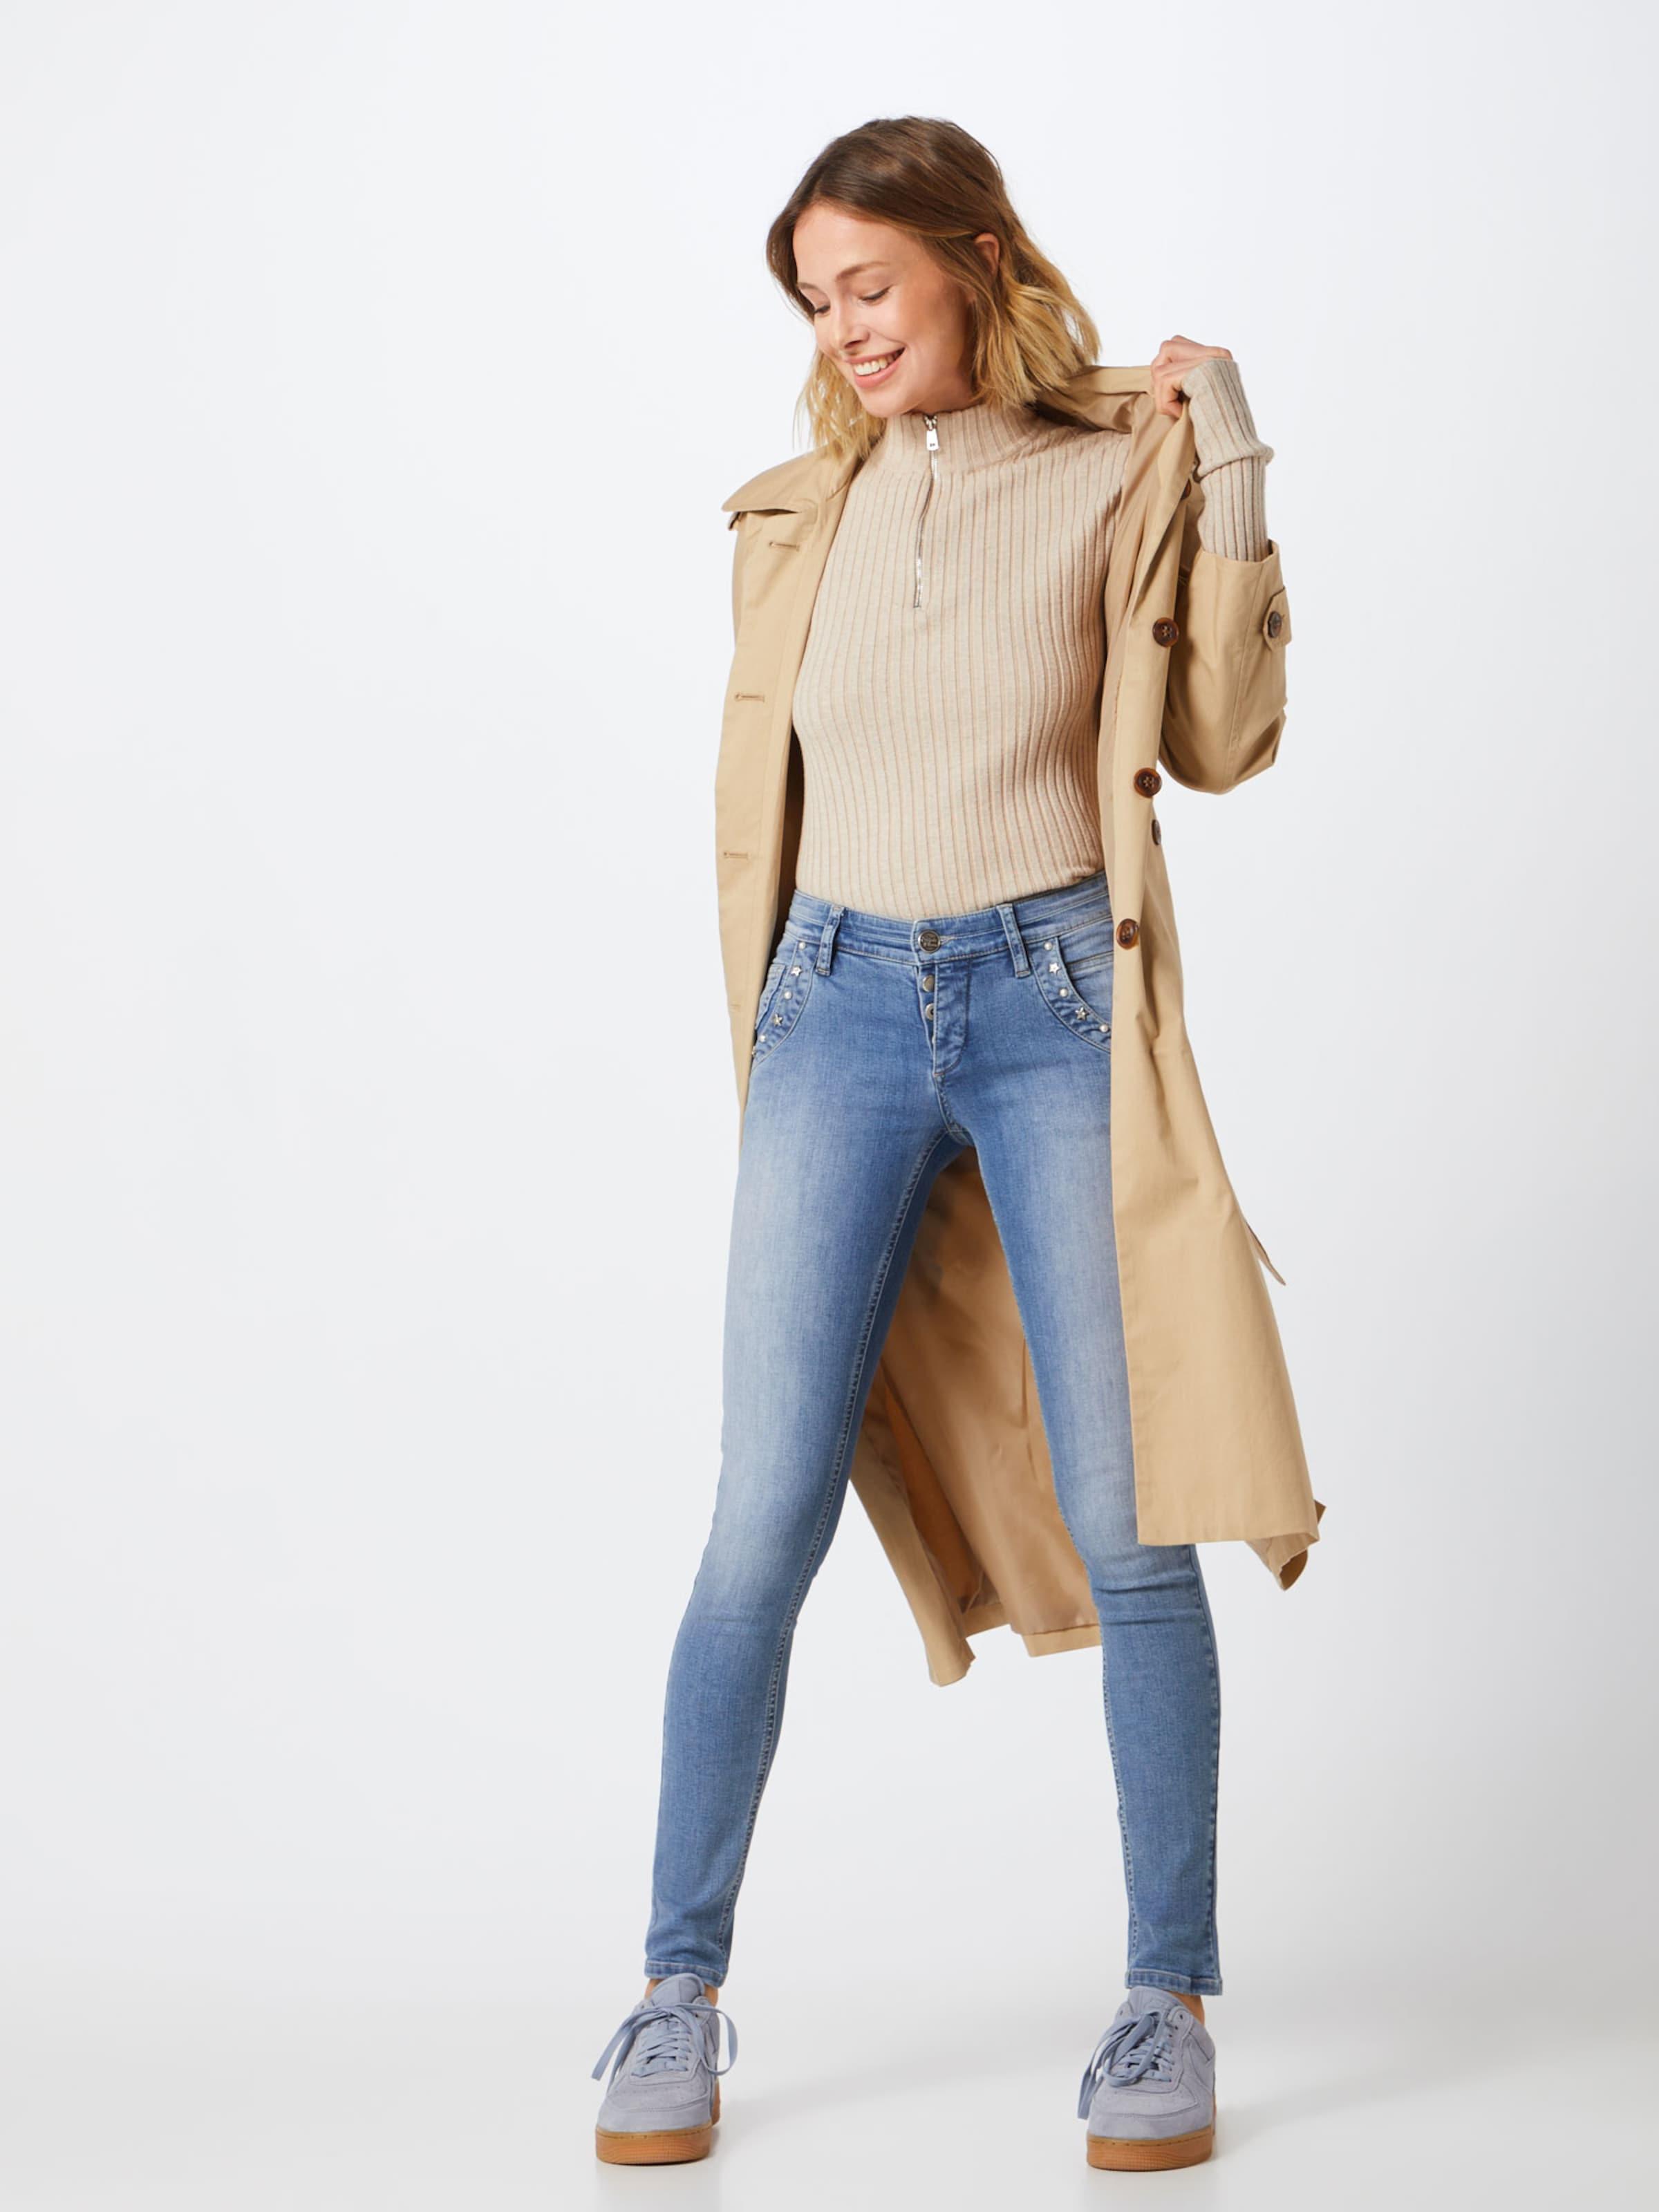 Glücksstern DenimClair En 'jeans' Bleu Jean FJcKT1l